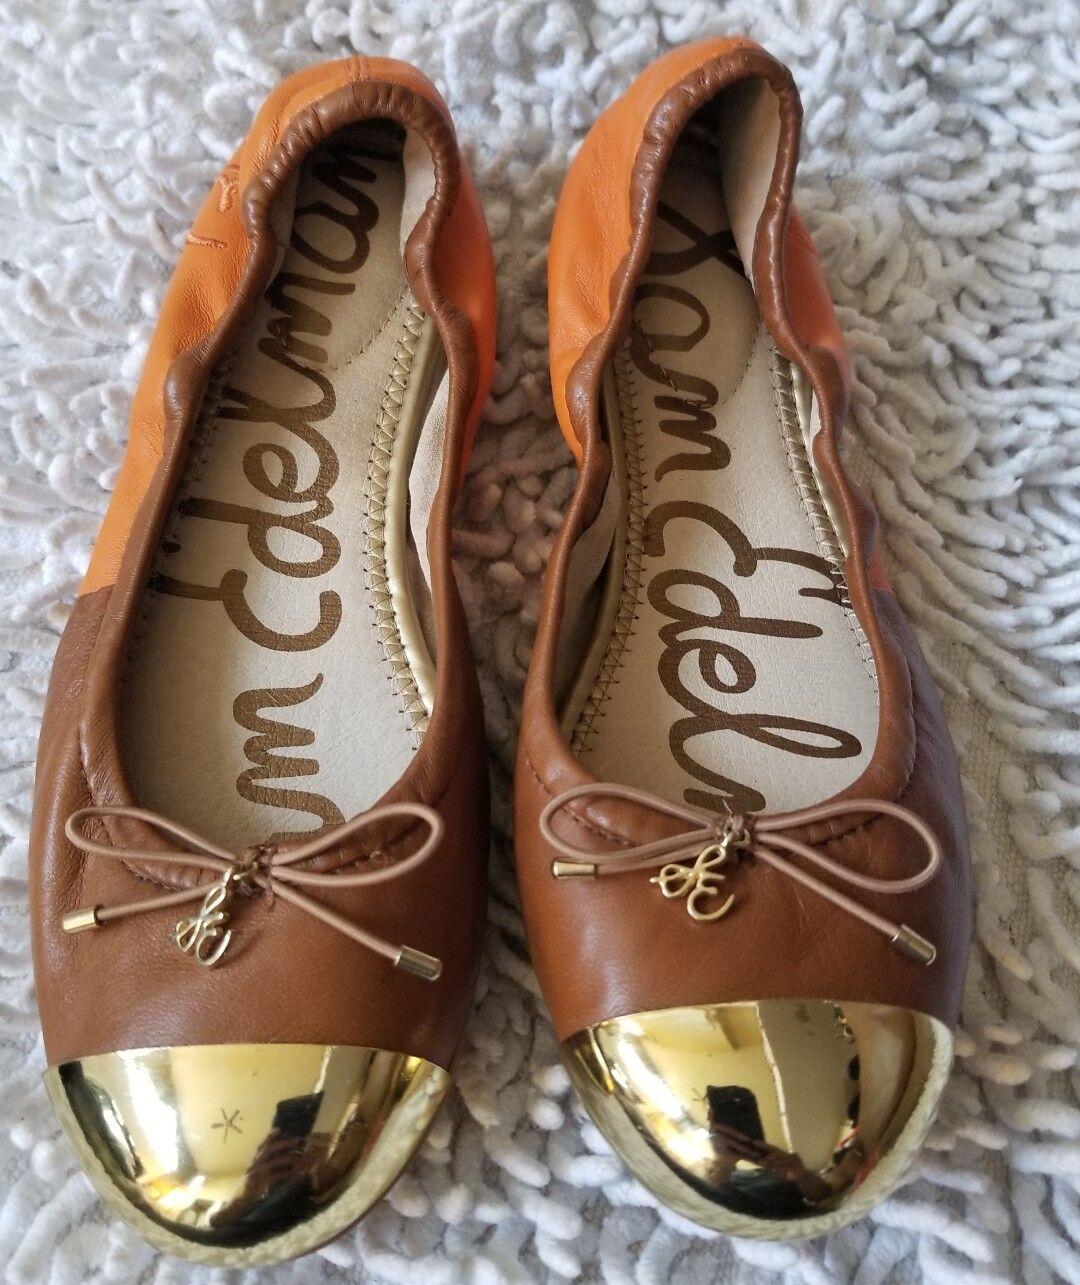 SAM EDELMAN FAIRLEIGH orange   brown leather cap toe ballet flats sz. 6